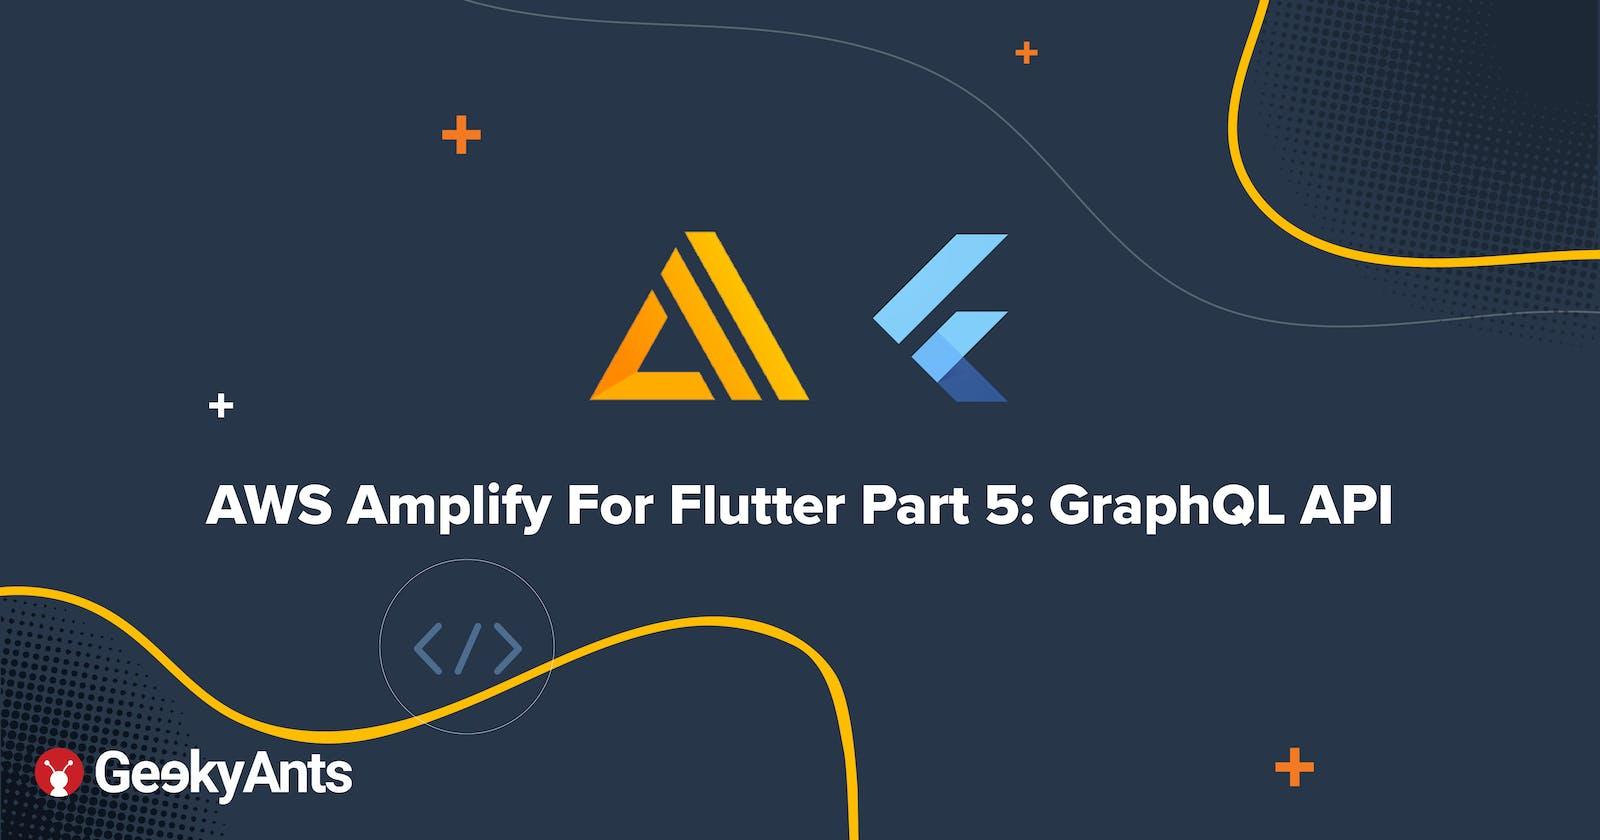 AWS Amplify For Flutter Part 5: GraphQL API